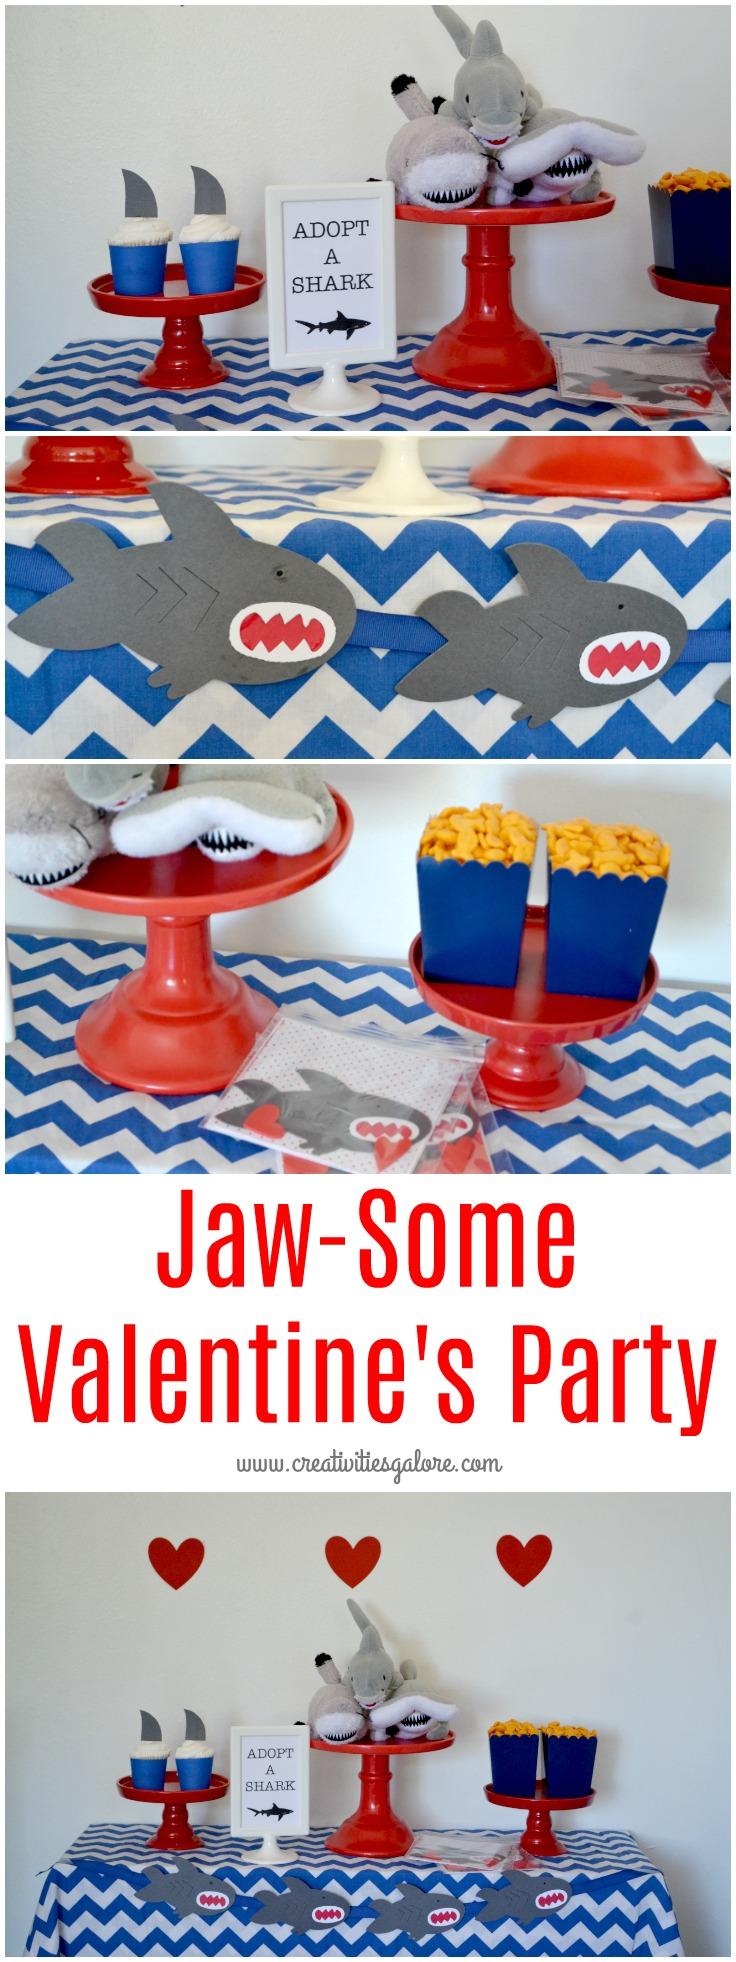 JawSome Valentine's Day Party